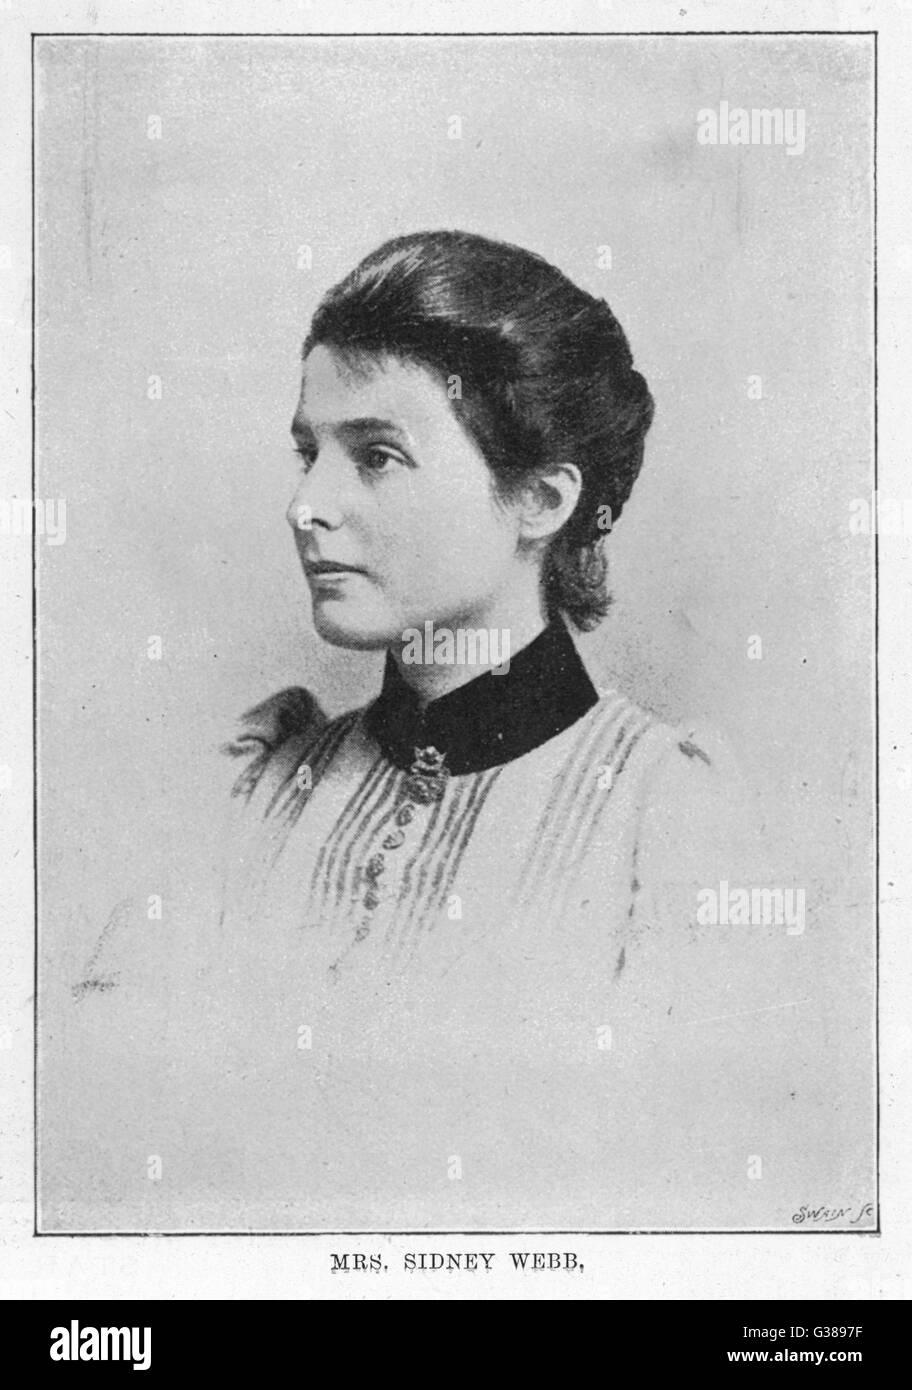 BEATRICE WEBB  economist and social  theorist       Date: 1858 - 1943 - Stock Image